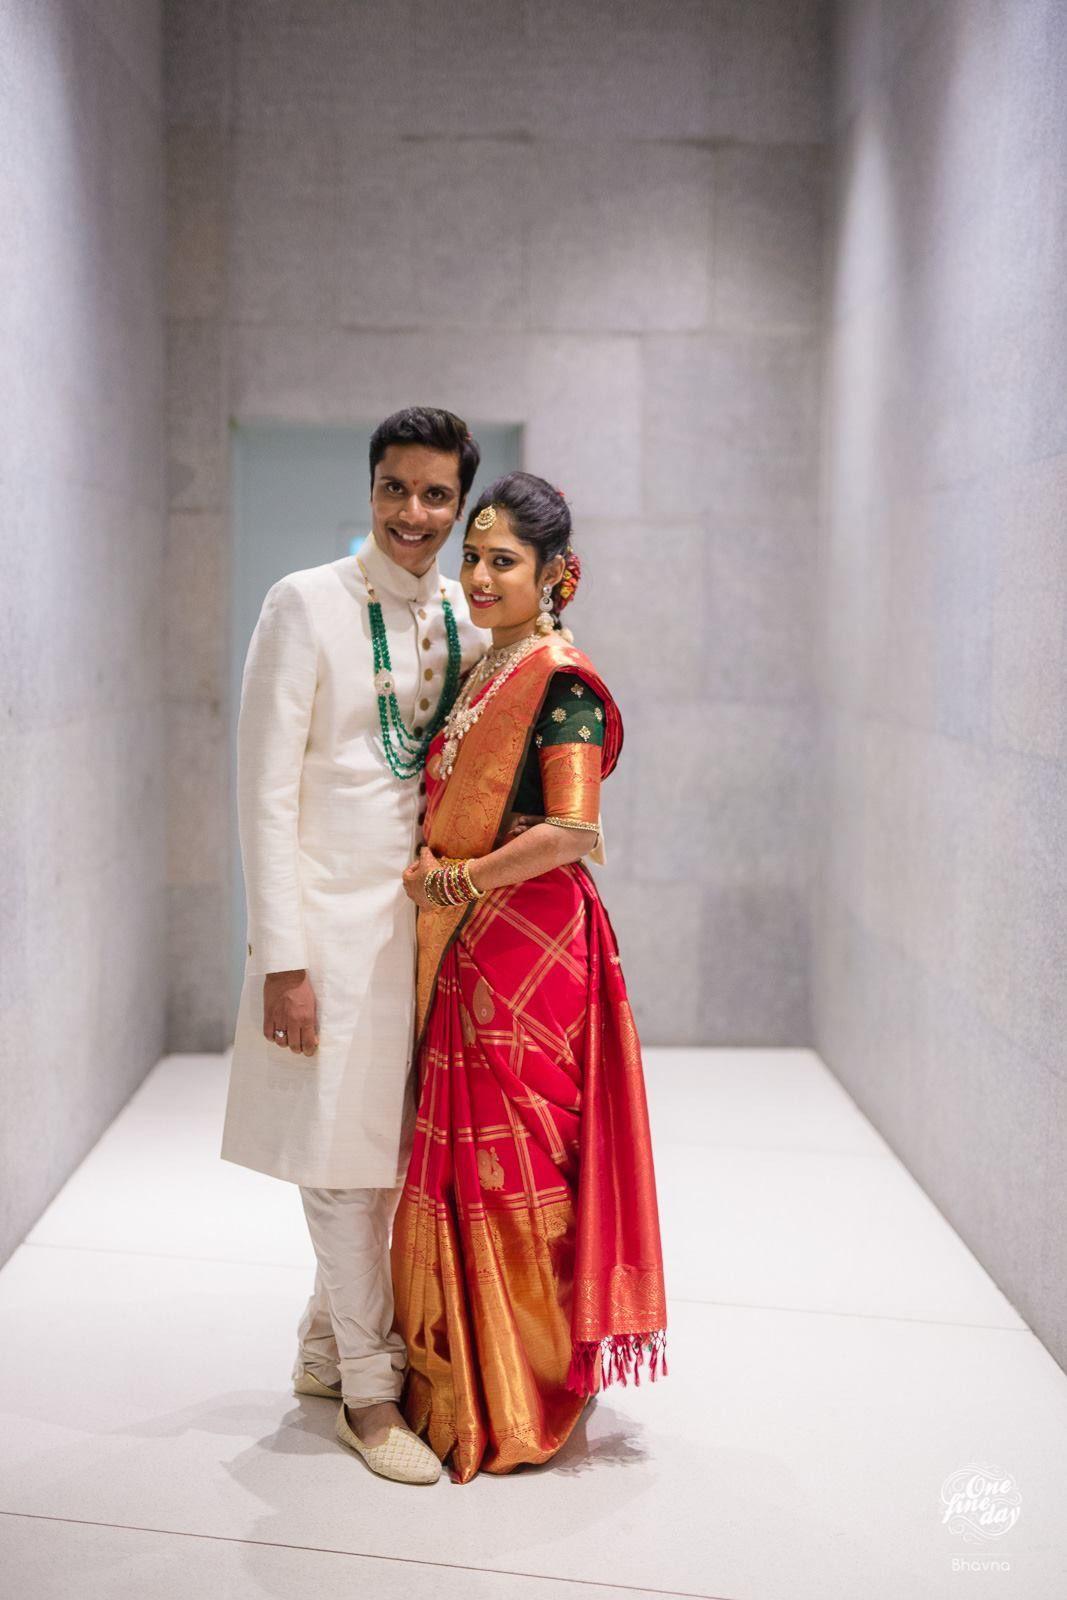 Marathi Couple Xpensive Wedding Dress Men Wedding Saree Collection Couple Dress [ 1600 x 1067 Pixel ]